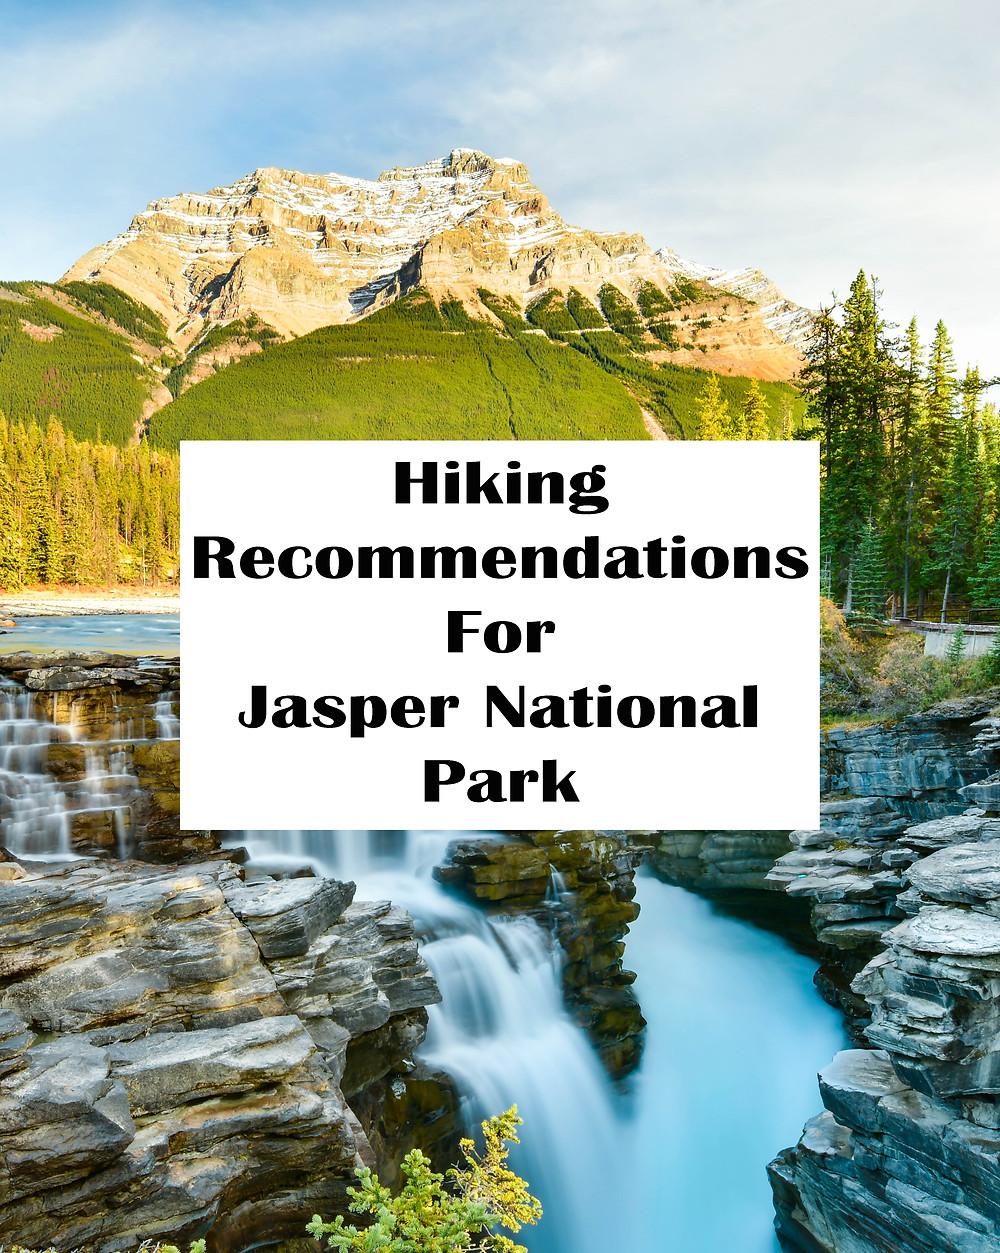 Hiking Recommendations For Jasper National Park